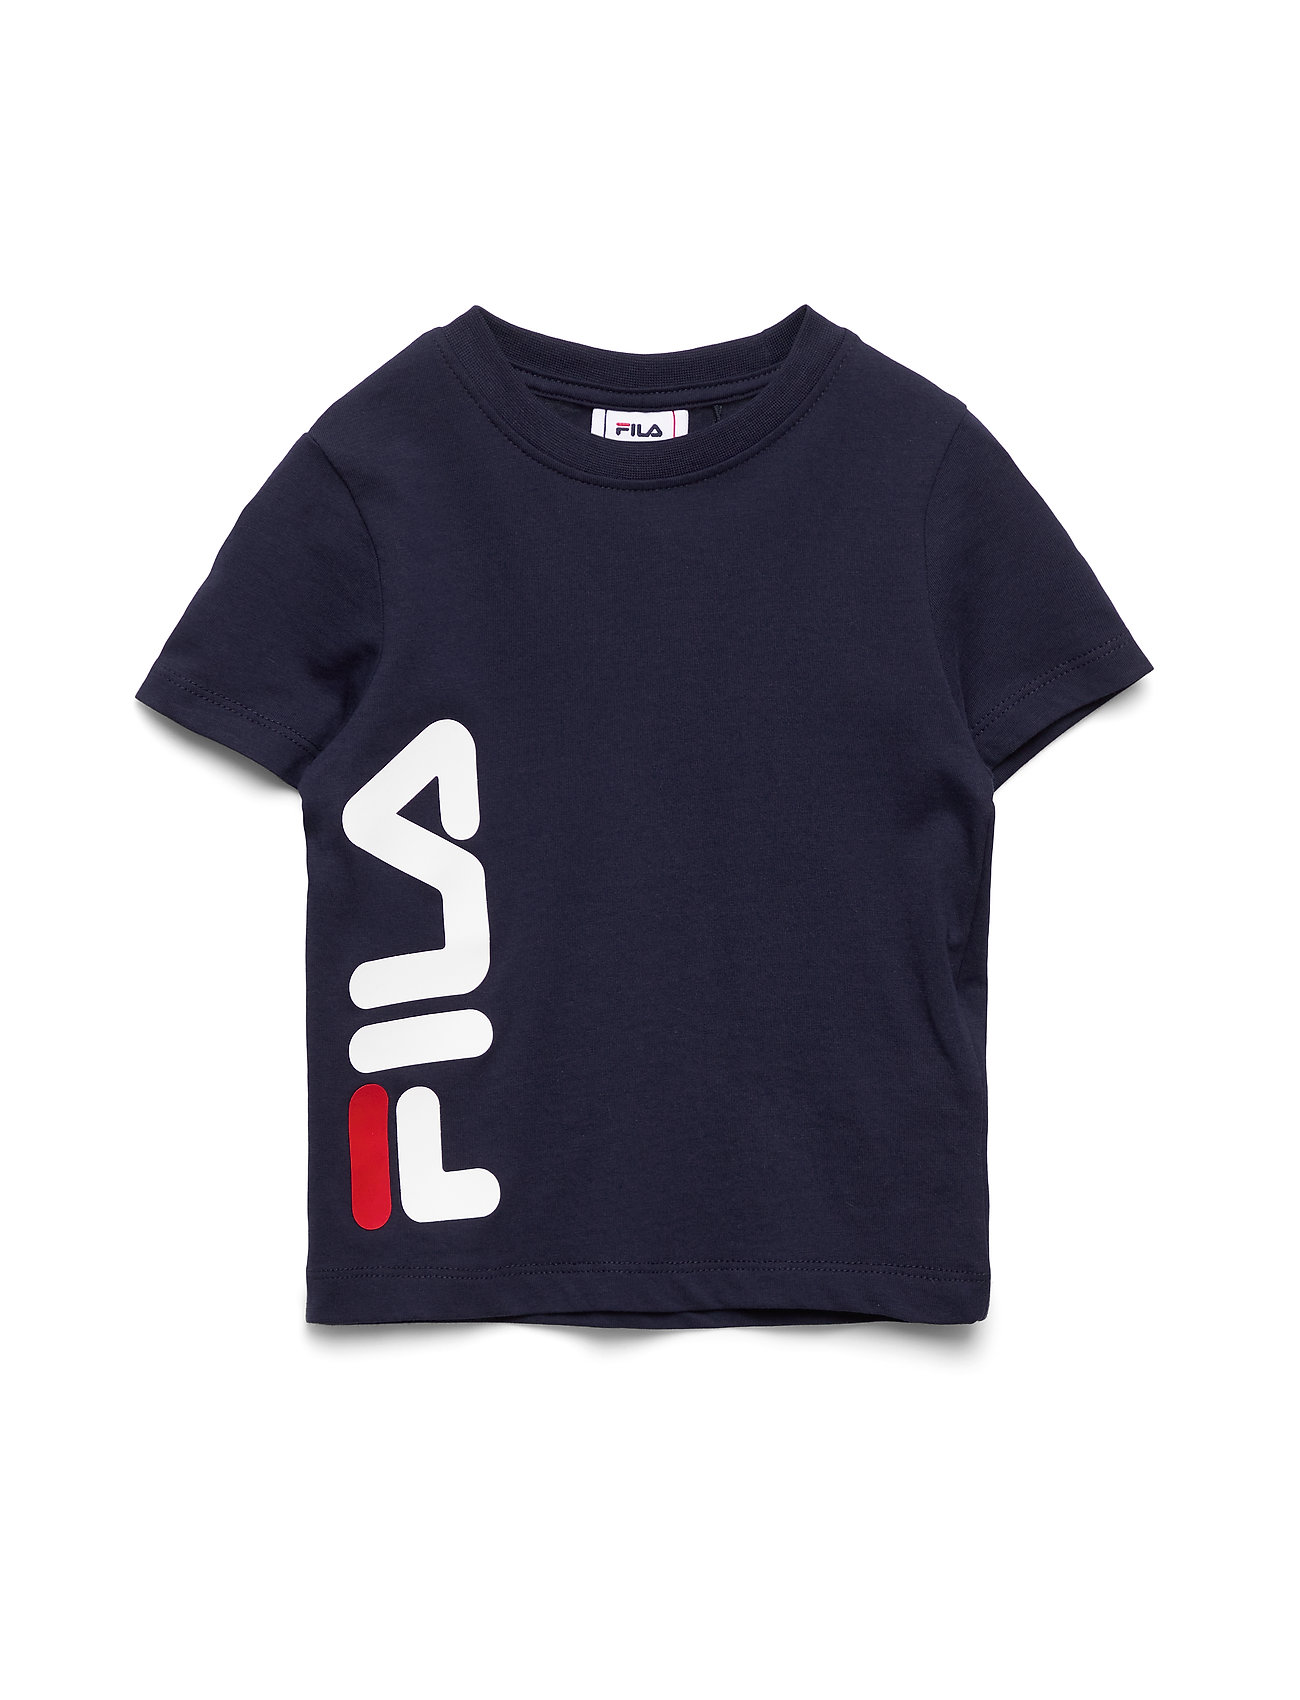 Image of Kids Tolla Tee T-shirt Blå FILA (3406320805)